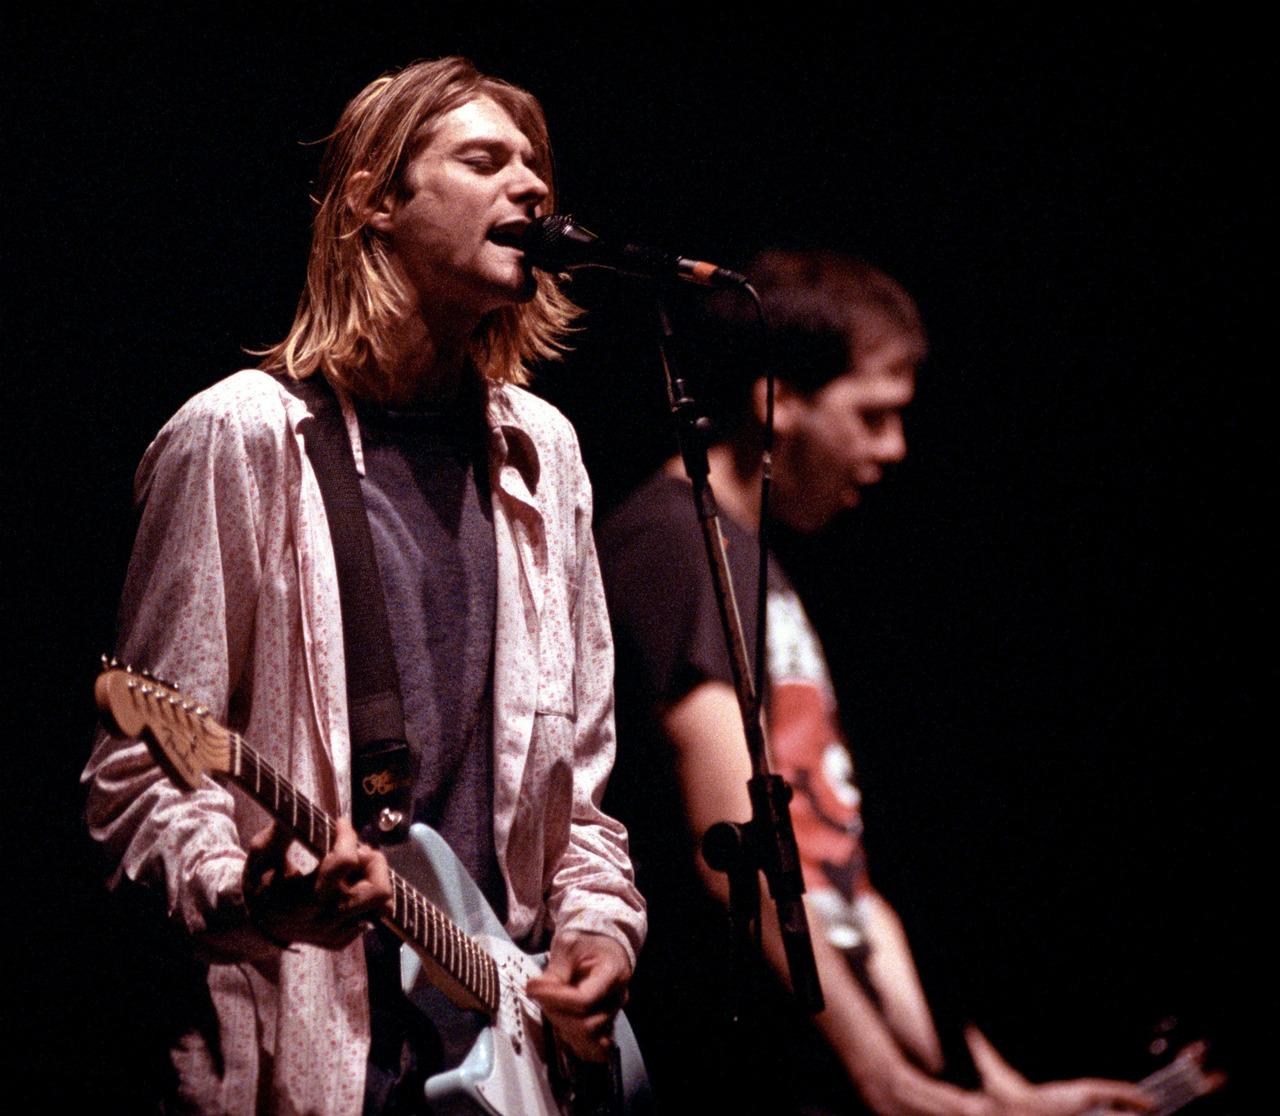 Видео Kurt Cobain и Fender Jag-Stang